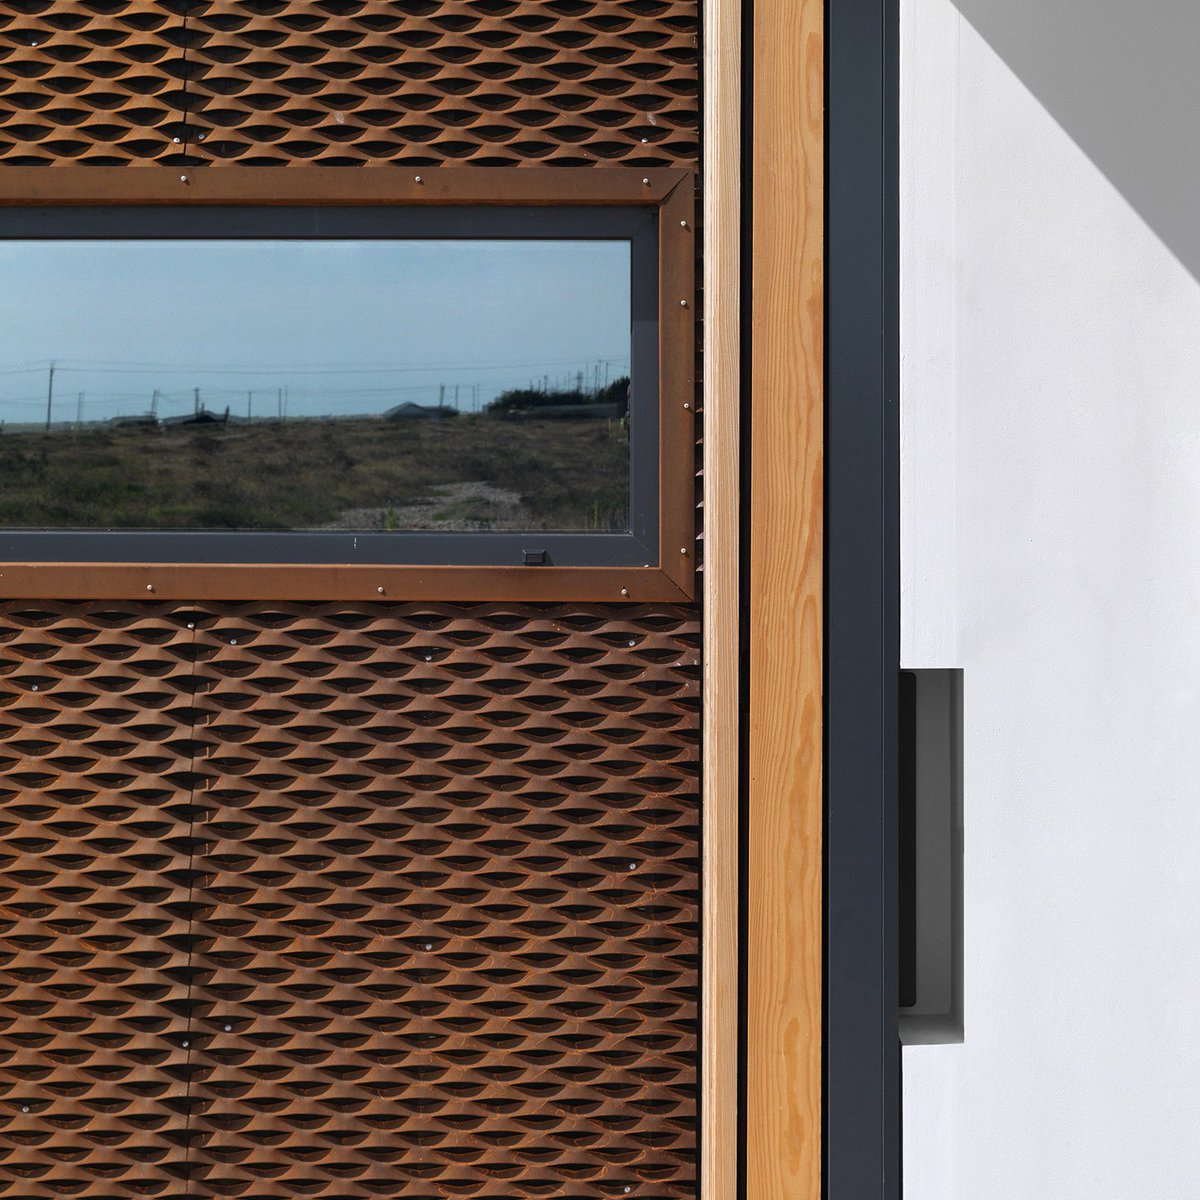 Fineline Aluminium on Twitter \ Pobble House | System 22 | Sliding Doors | Architect Guy Holloway Photo Charles Hosea #Design #Architecture #Minimalist ... & Fineline Aluminium on Twitter: \